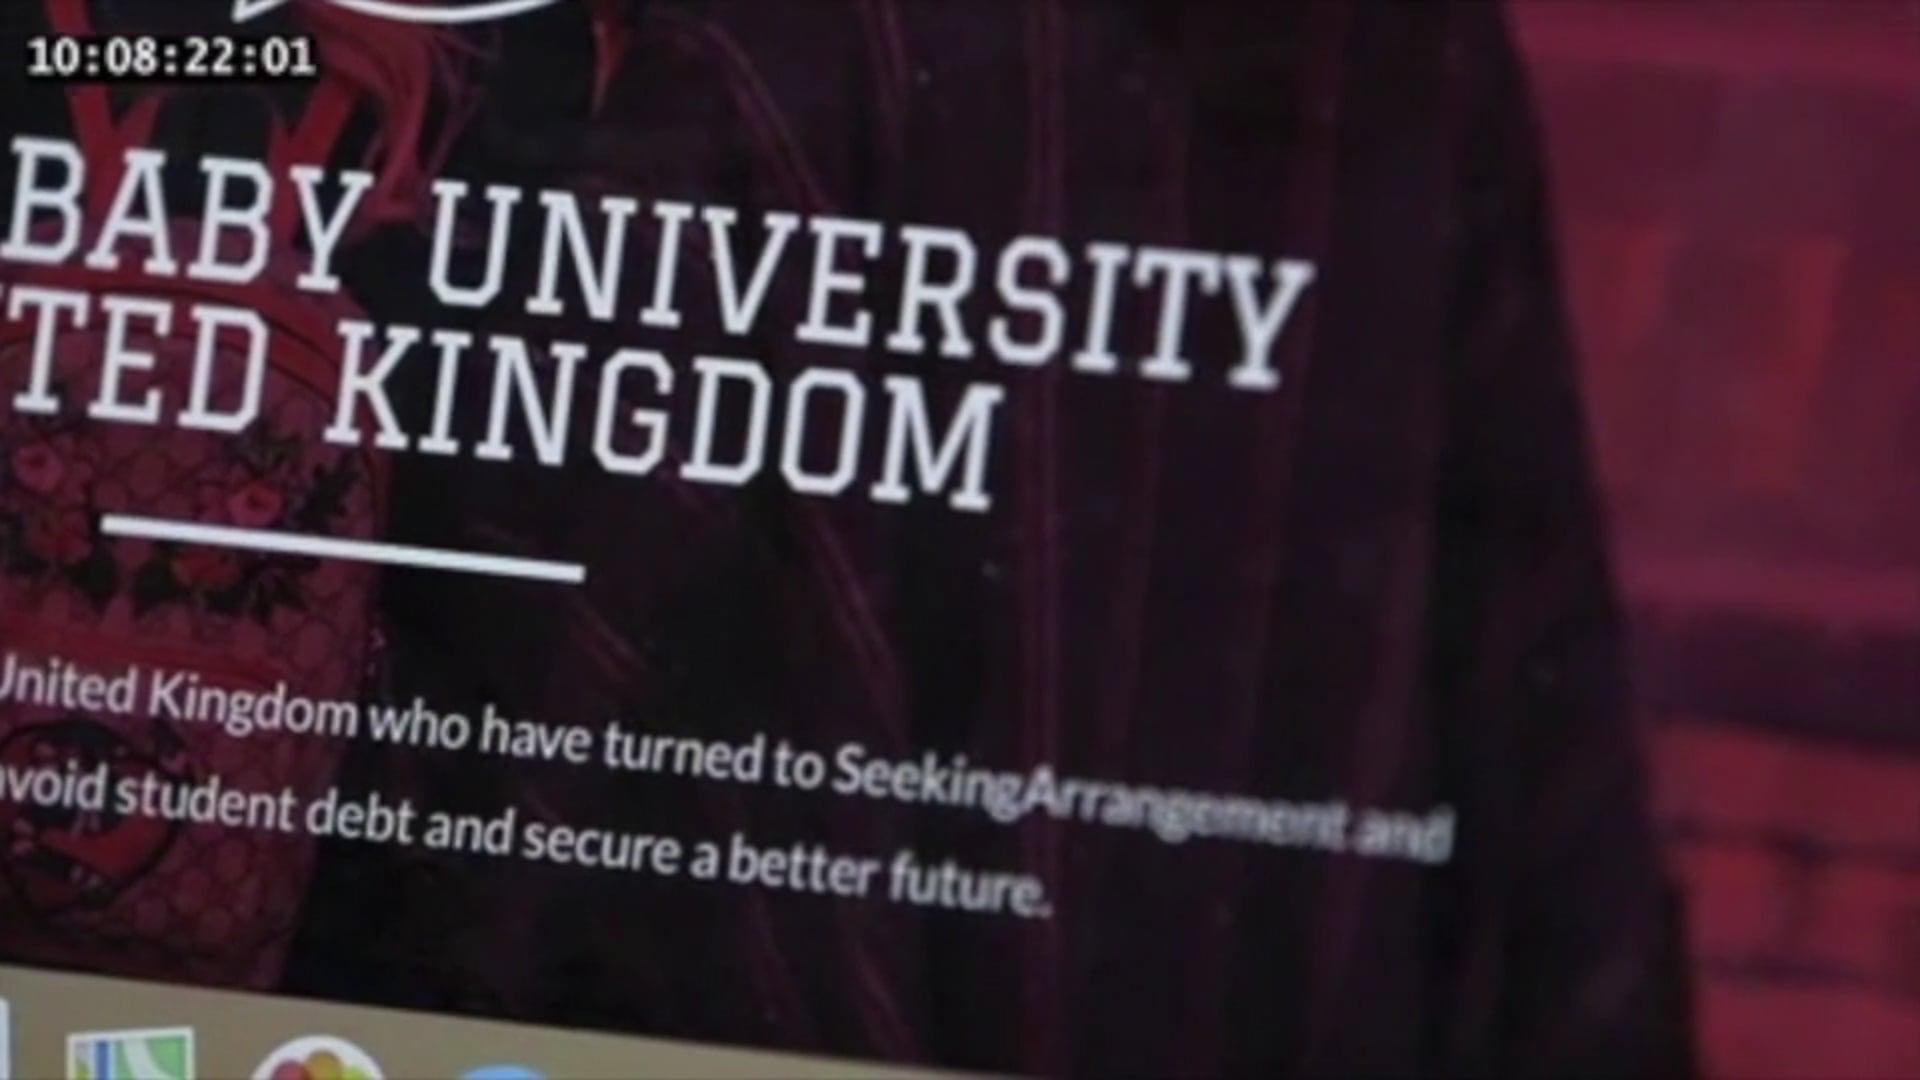 University Kingdom